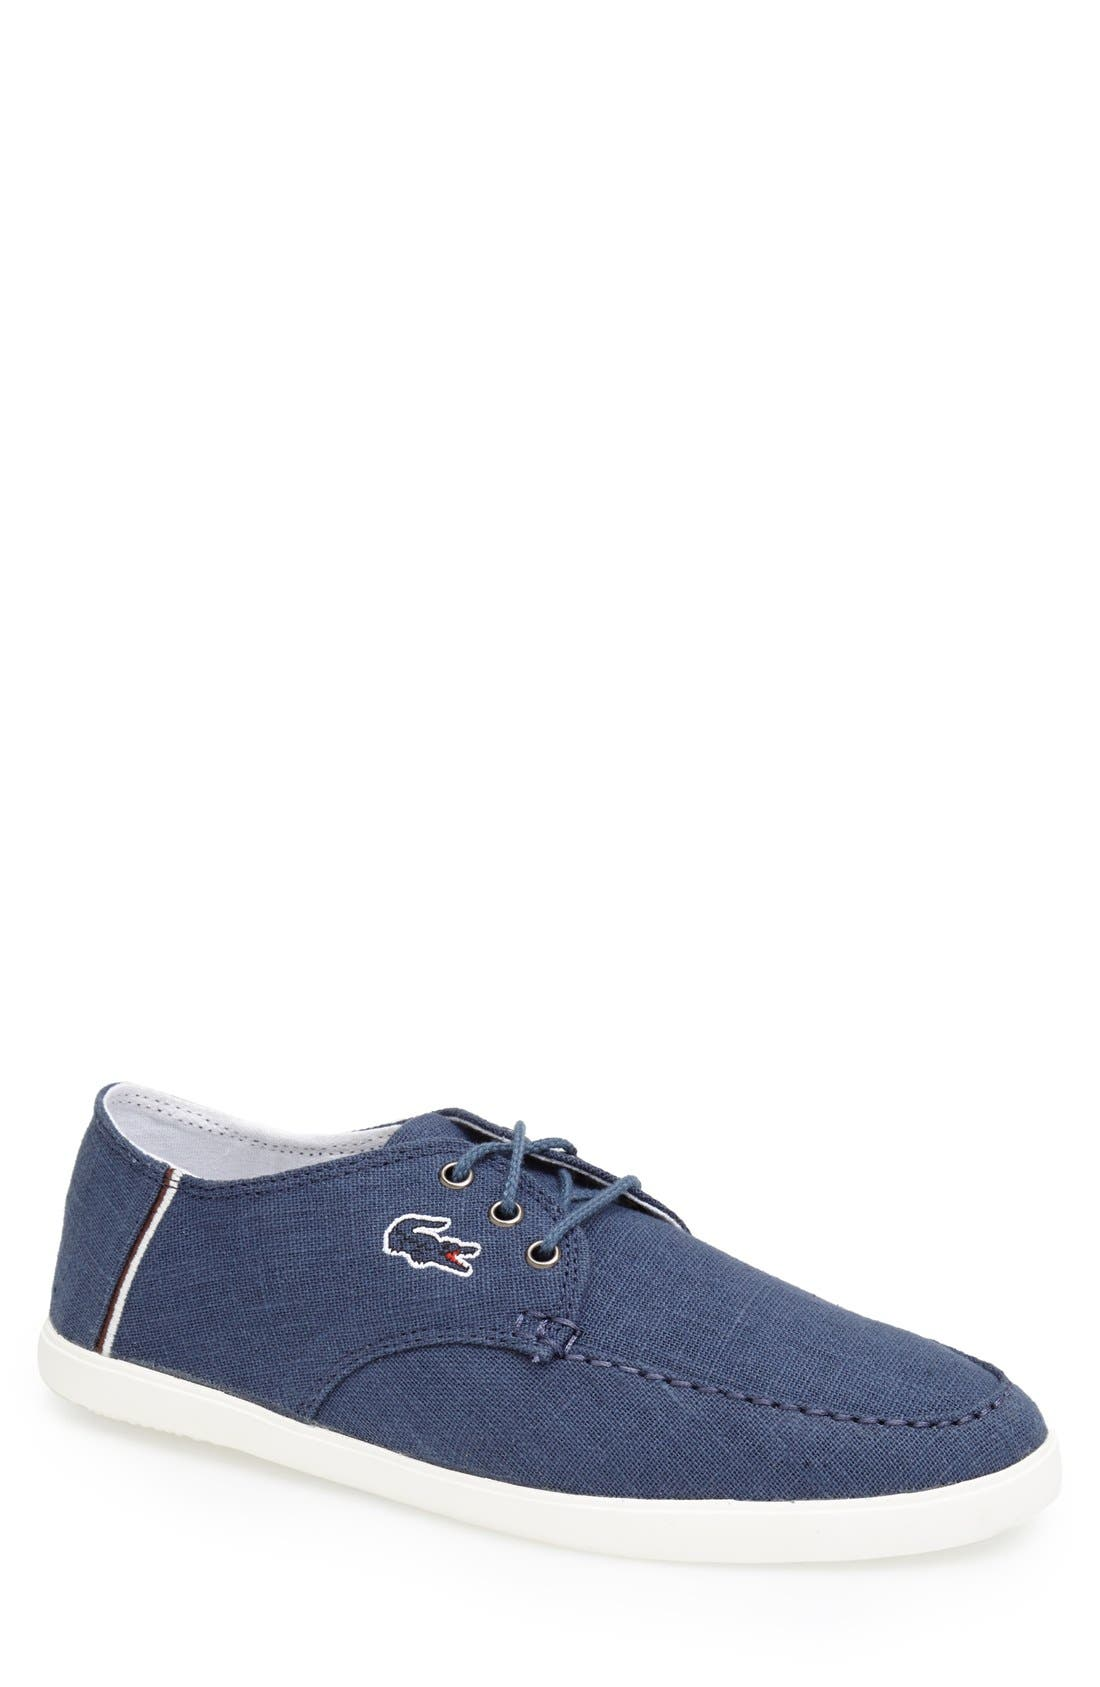 Main Image - Lacoste 'Artiside 12' Sneaker (Men)